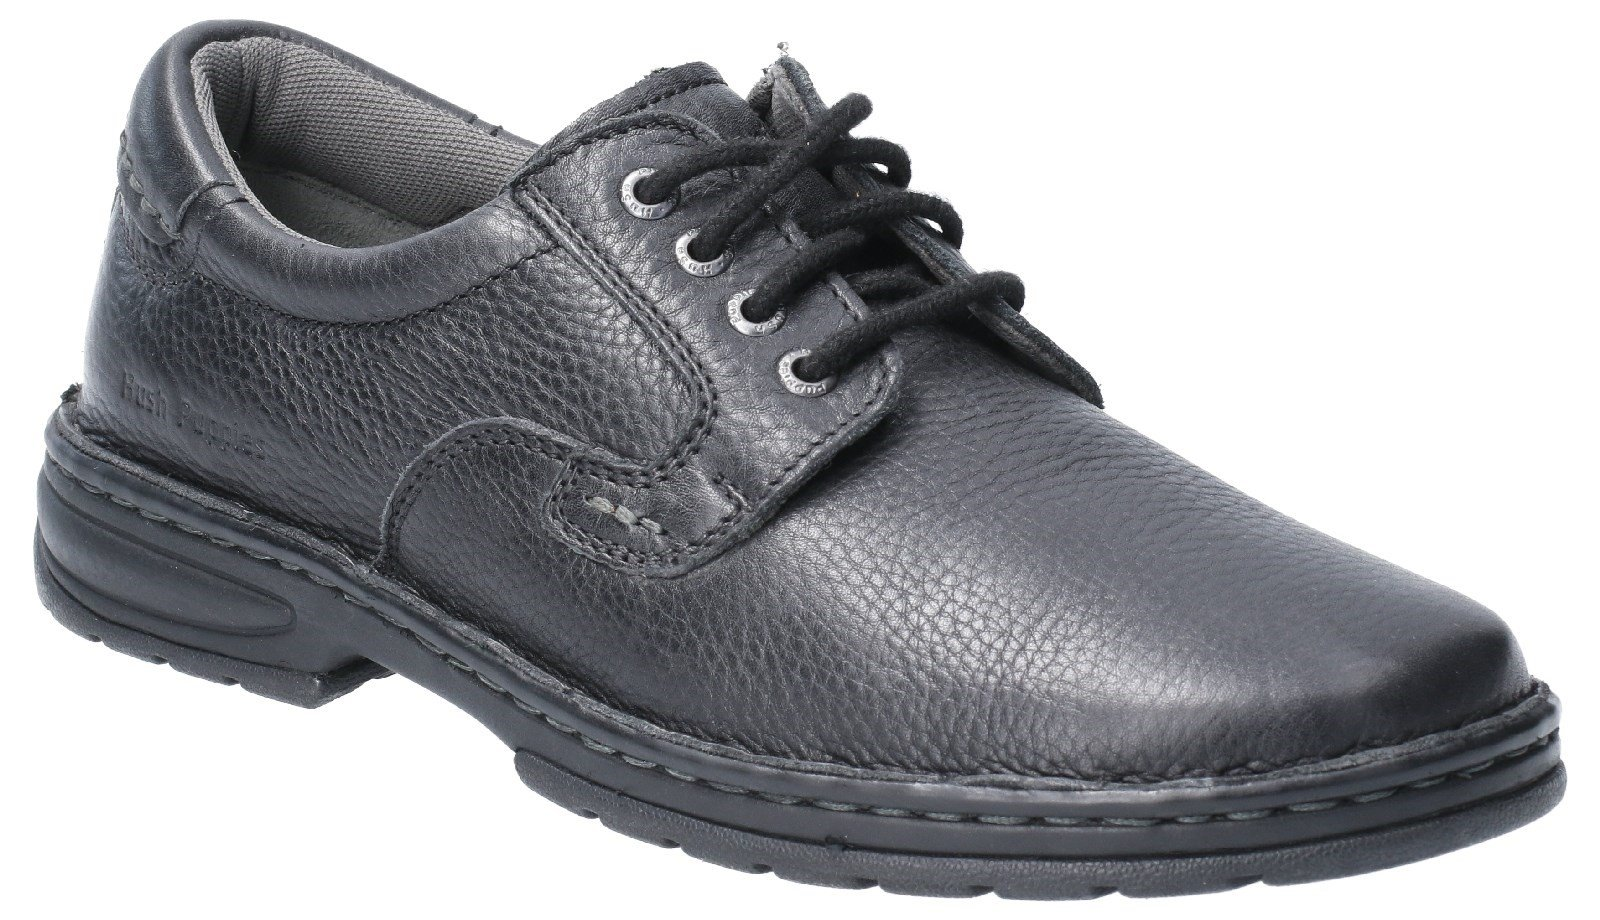 Hush Puppies Men's Outlaw II Lace Up Shoe Various Colours 29168 - Black 6